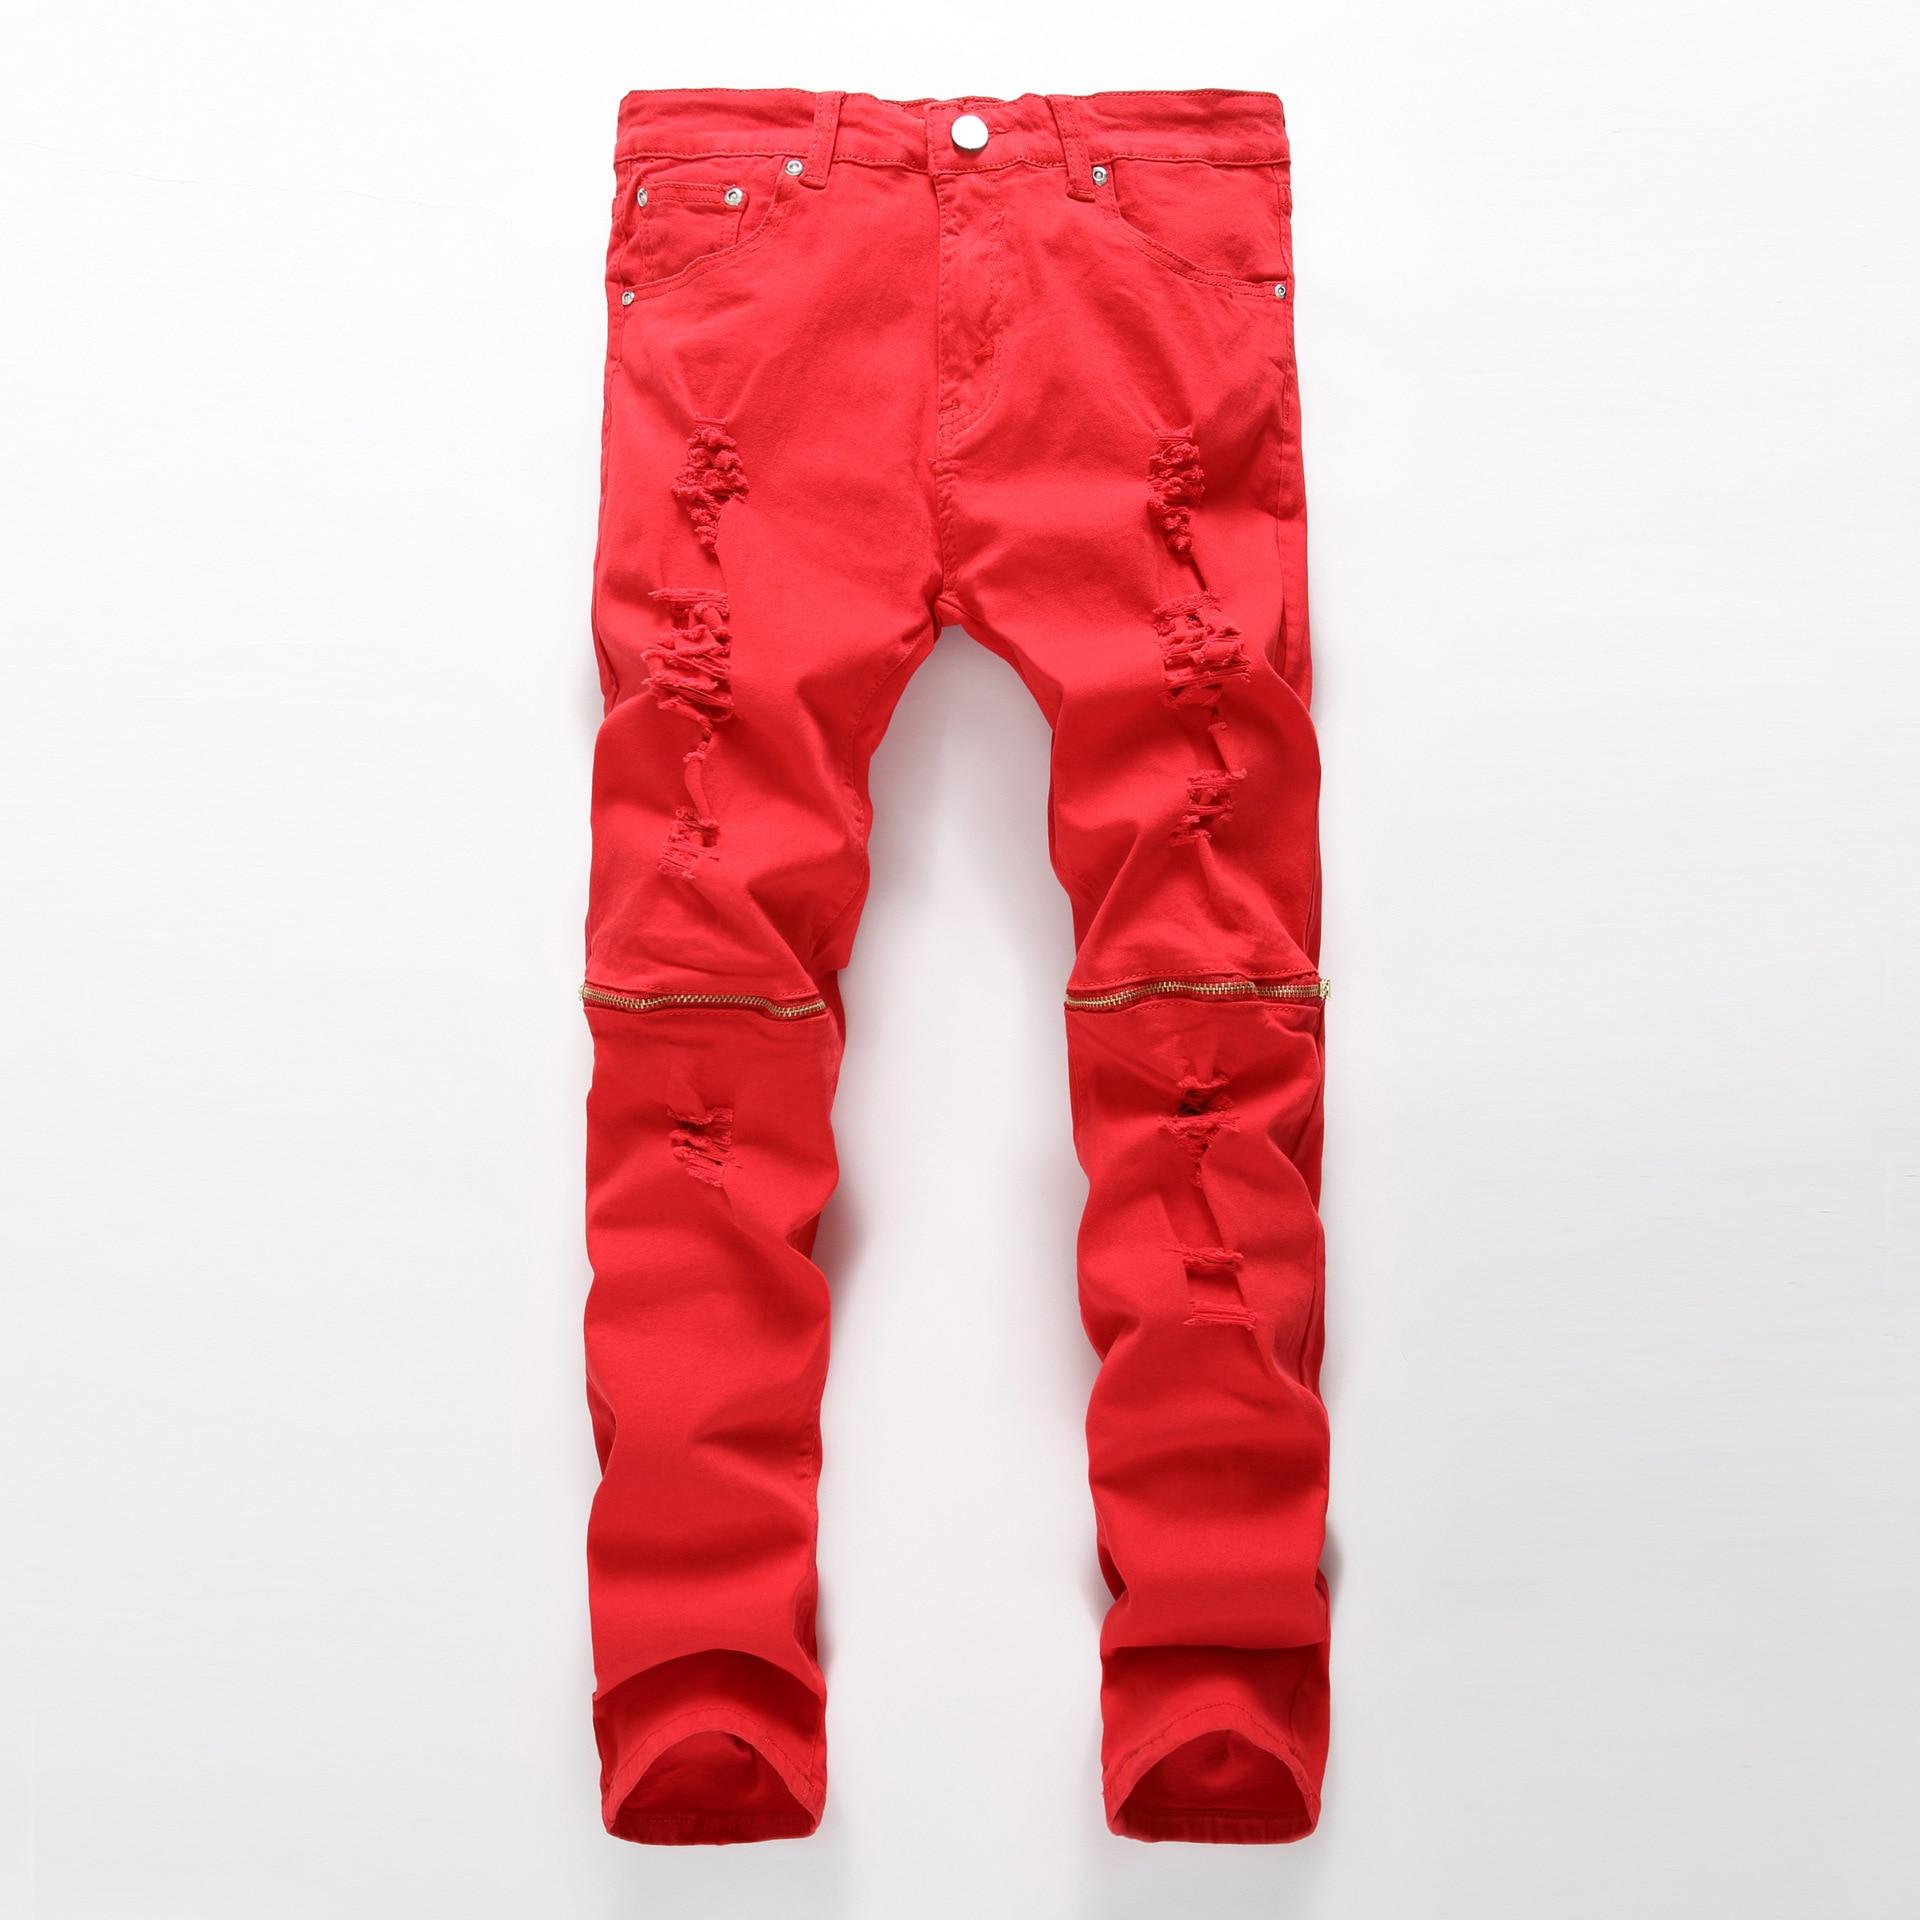 Red zipper decoration Skinny jeans men Ripped jeans Fashion Casual Slim fit Biker jeans Hip hop Denim elastic cotton trousers 2017 fashion patch jeans men slim straight denim jeans ripped trousers new famous brand biker jeans logo mens zipper jeans 604